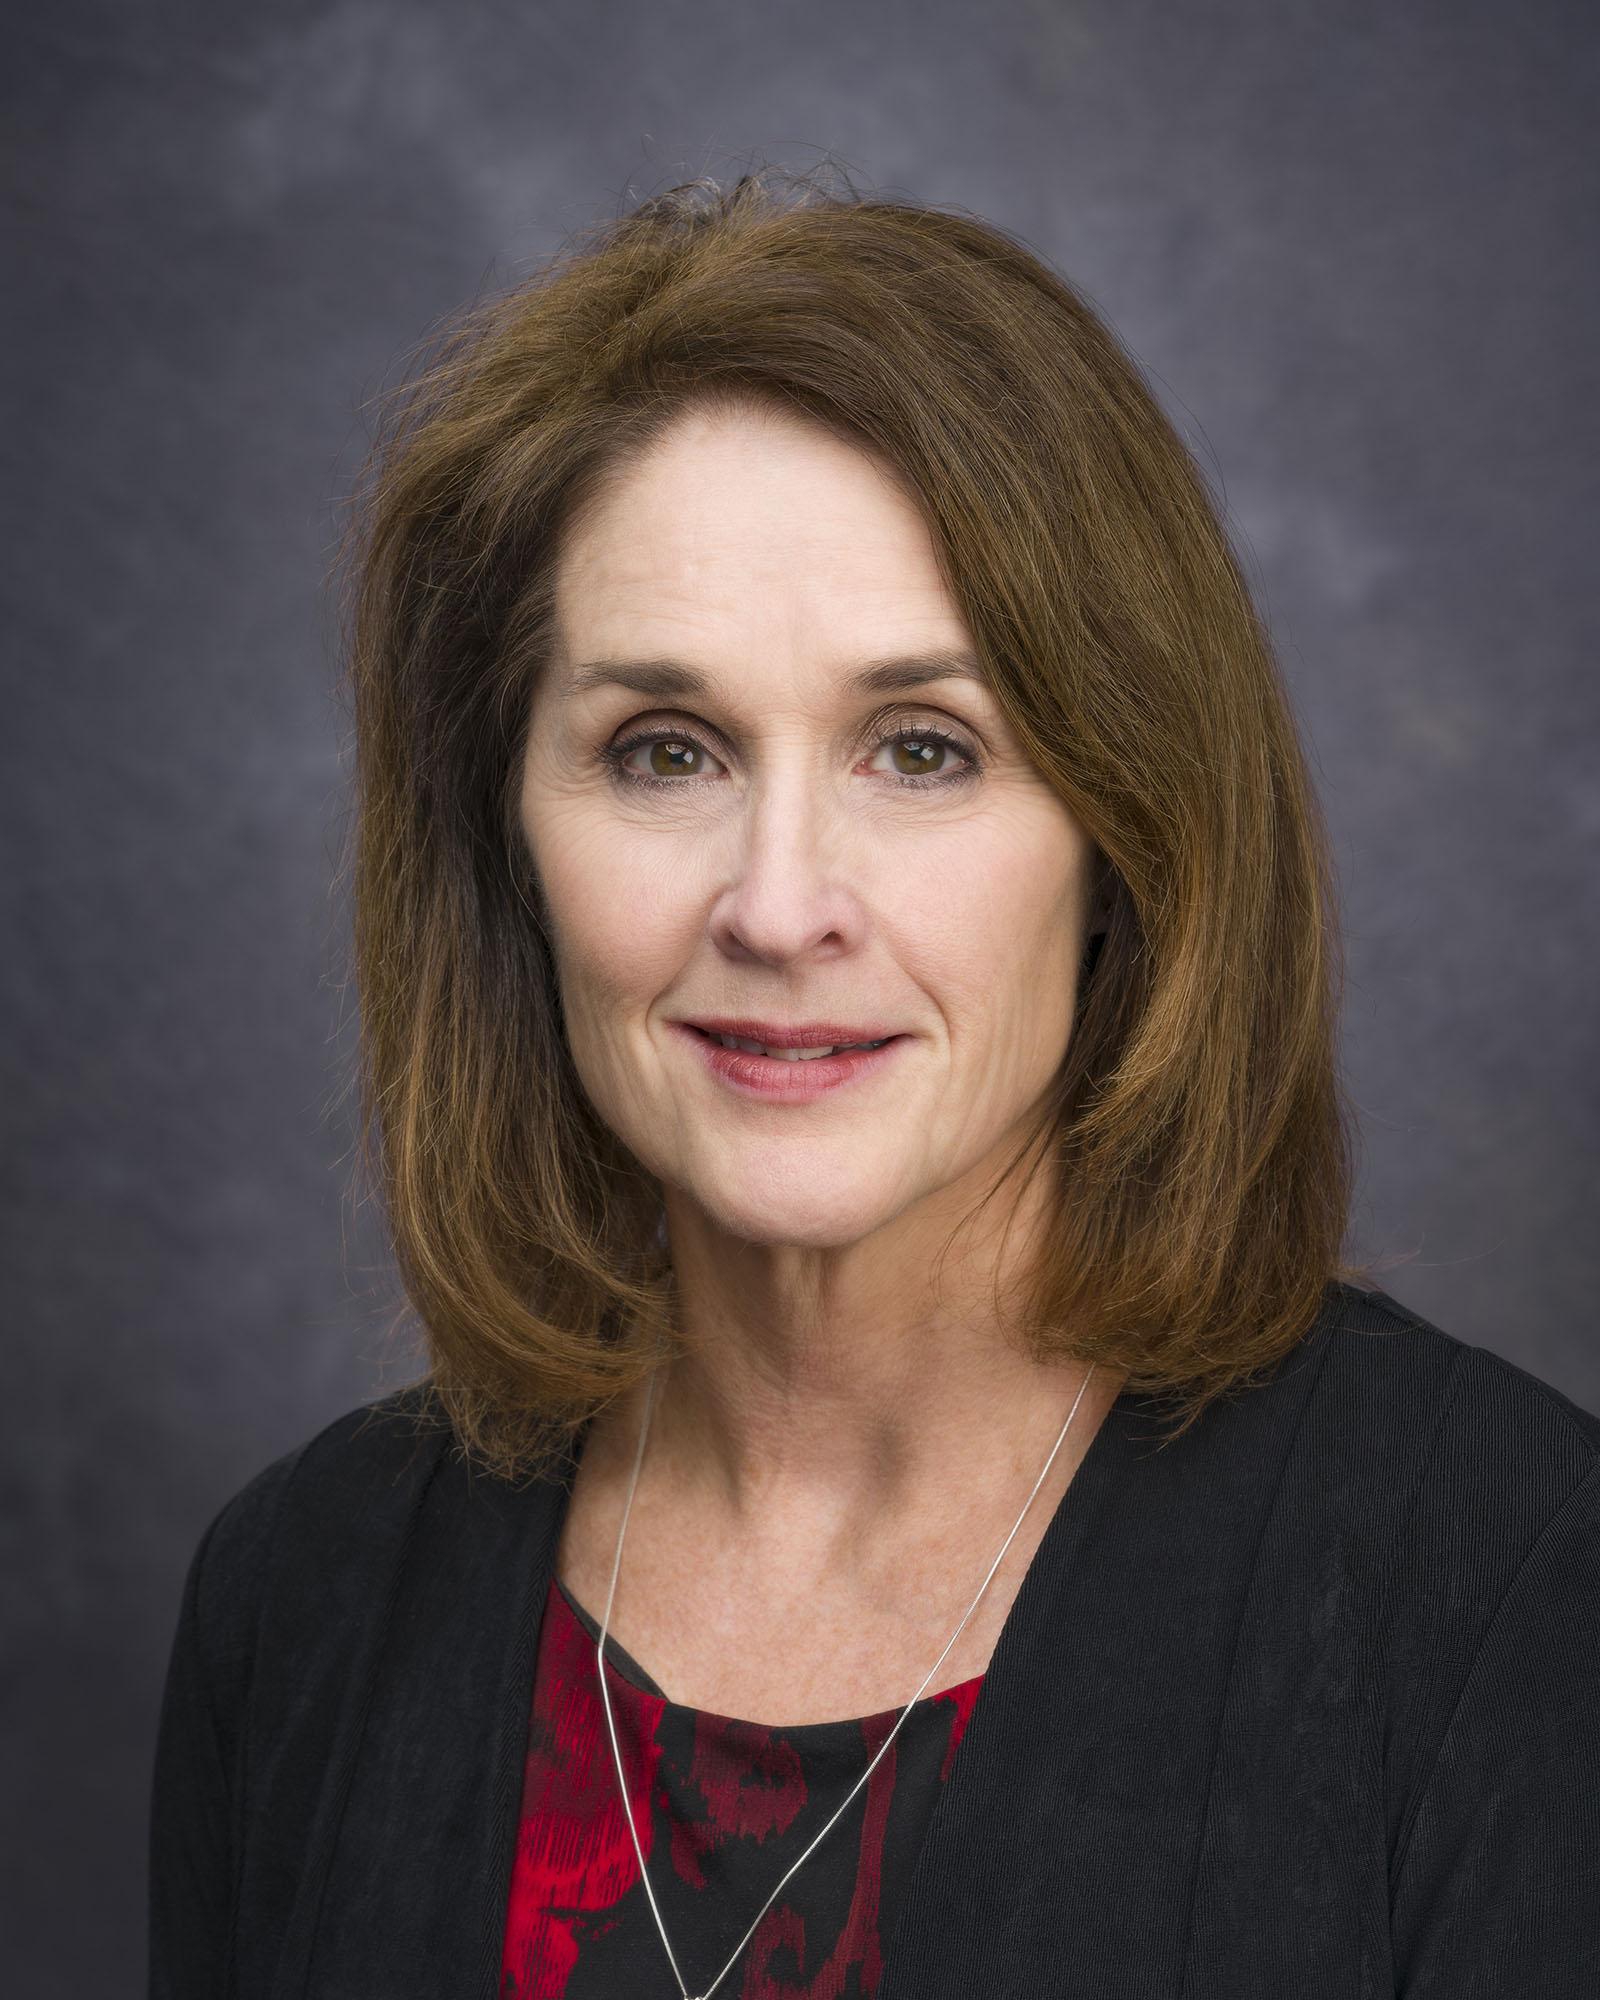 Cheryl Tiahrt